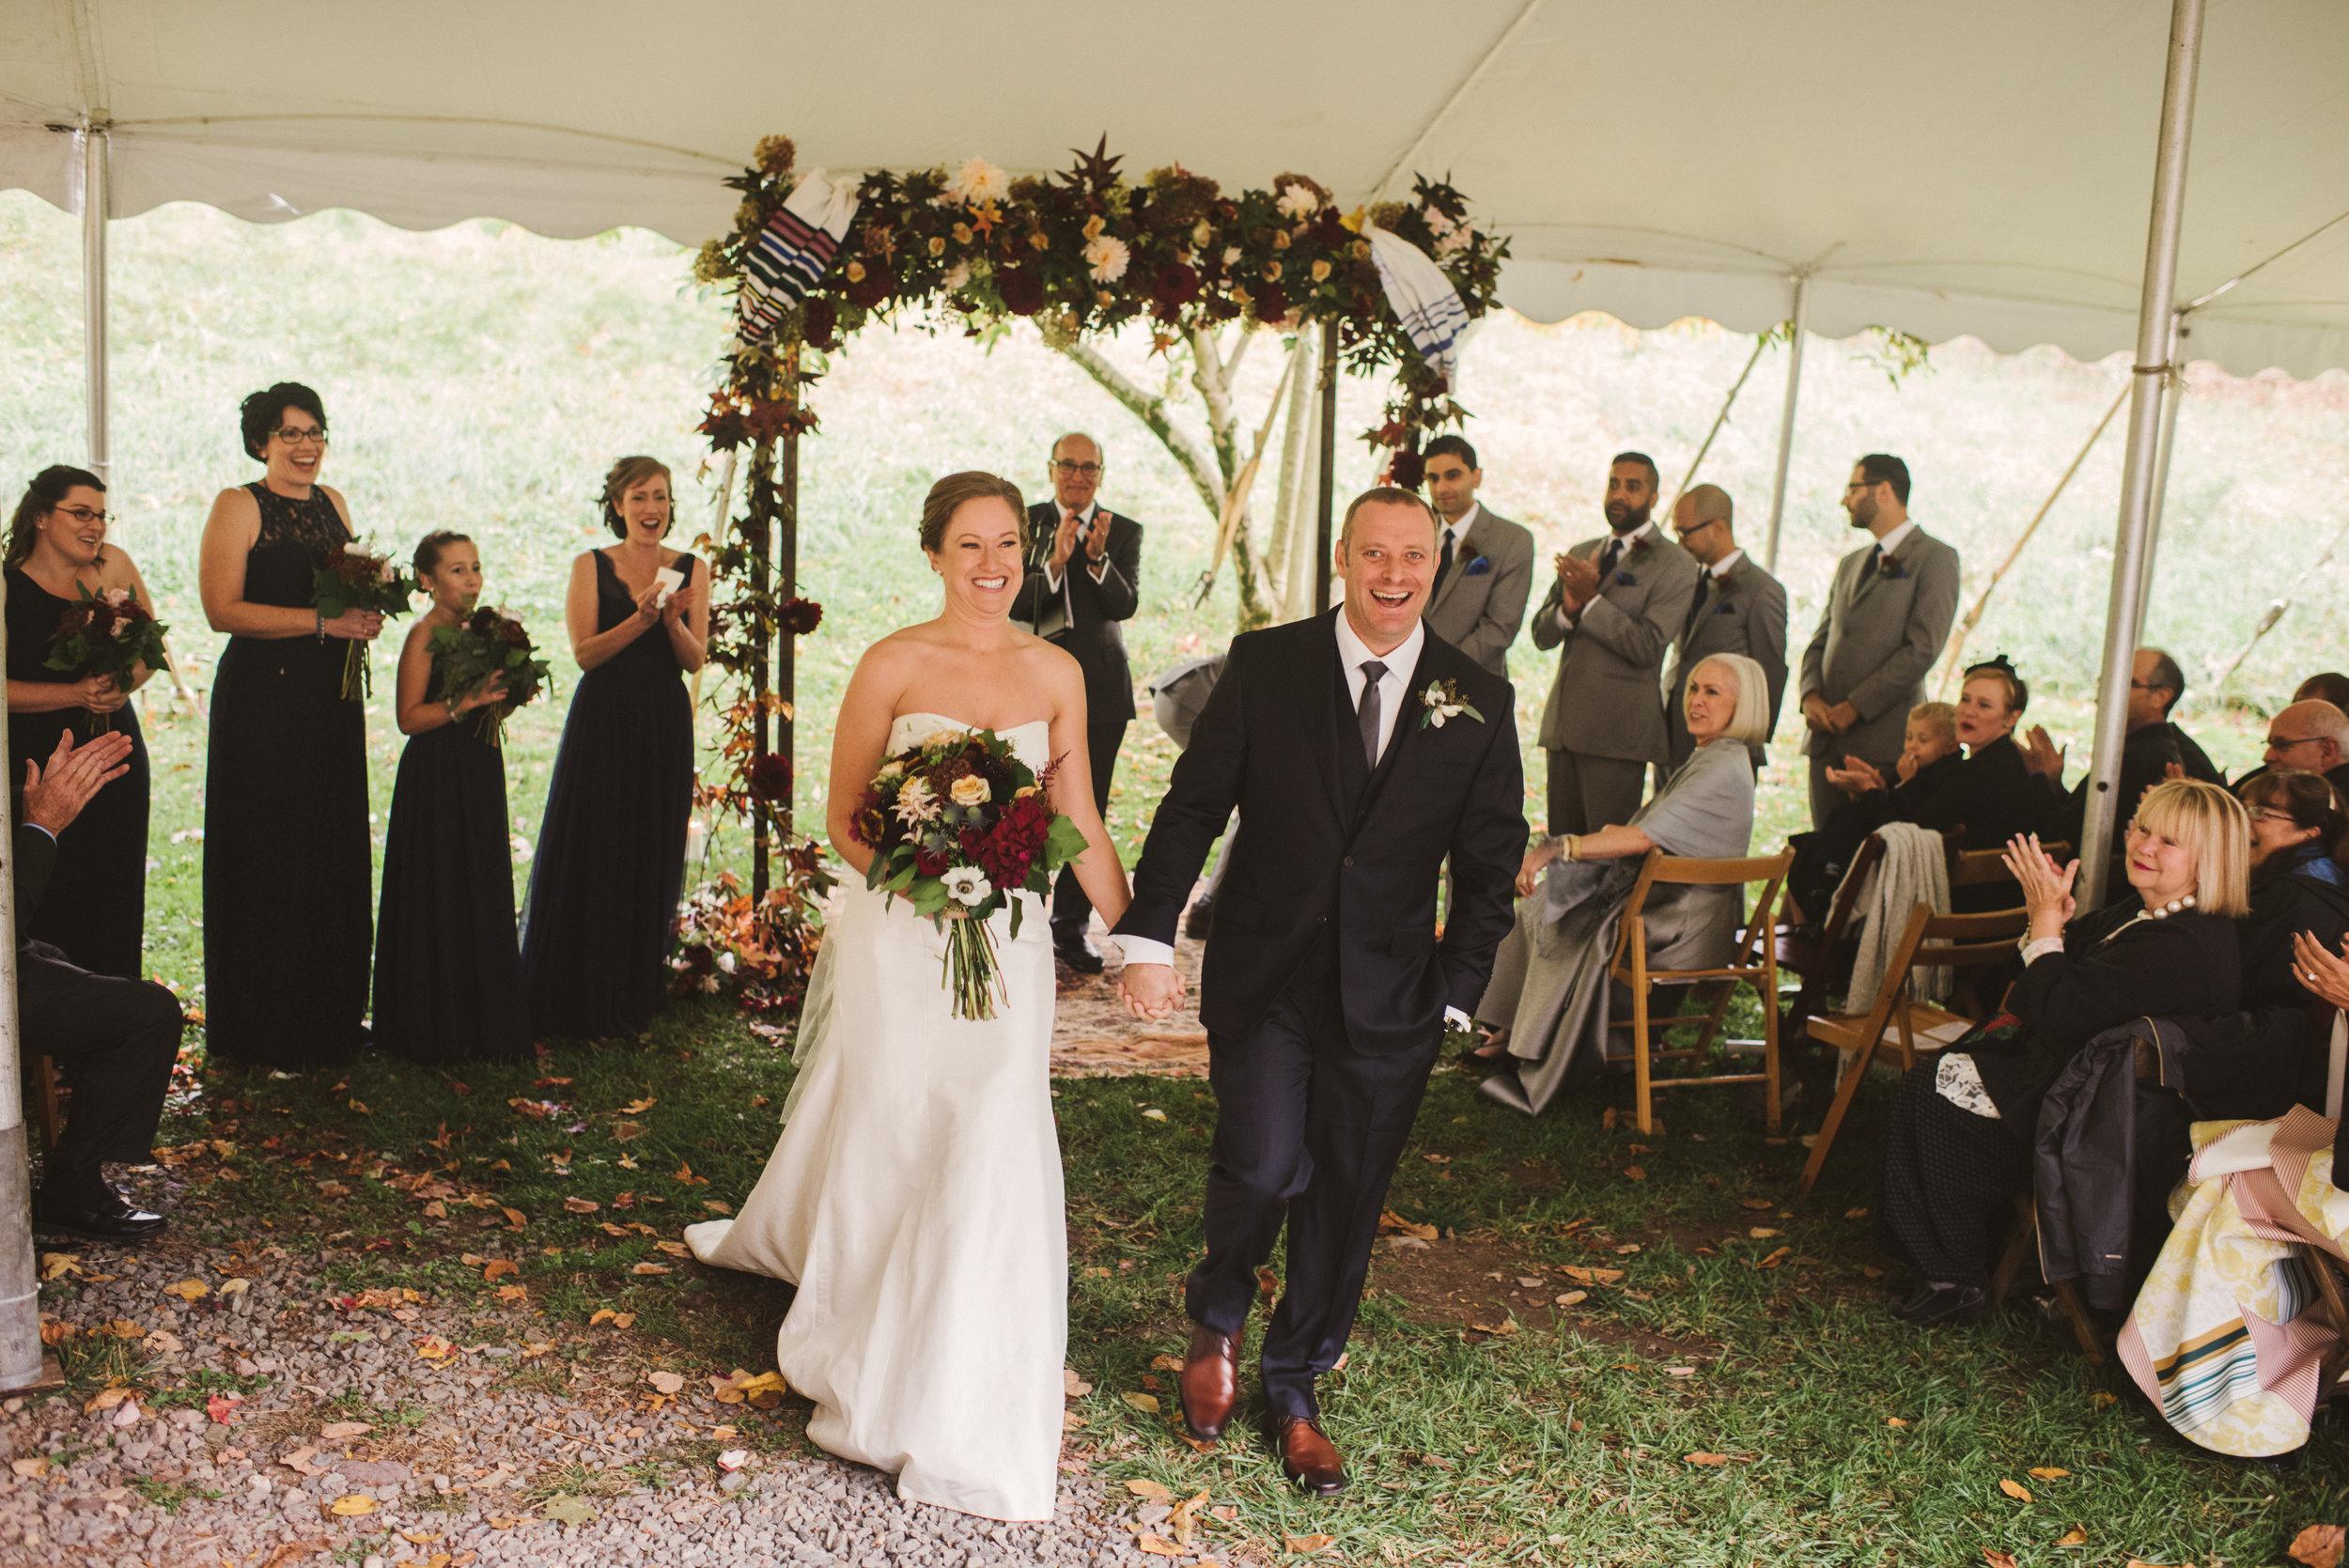 JACQUELINE & ANDREW WARSHAWER -BROOKMILL FARM FALL WEDDING - INTIMATE WEDDING PHOTOGRAPHER - TWOTWENTY by CHI-CHI AGBIM-283.jpg